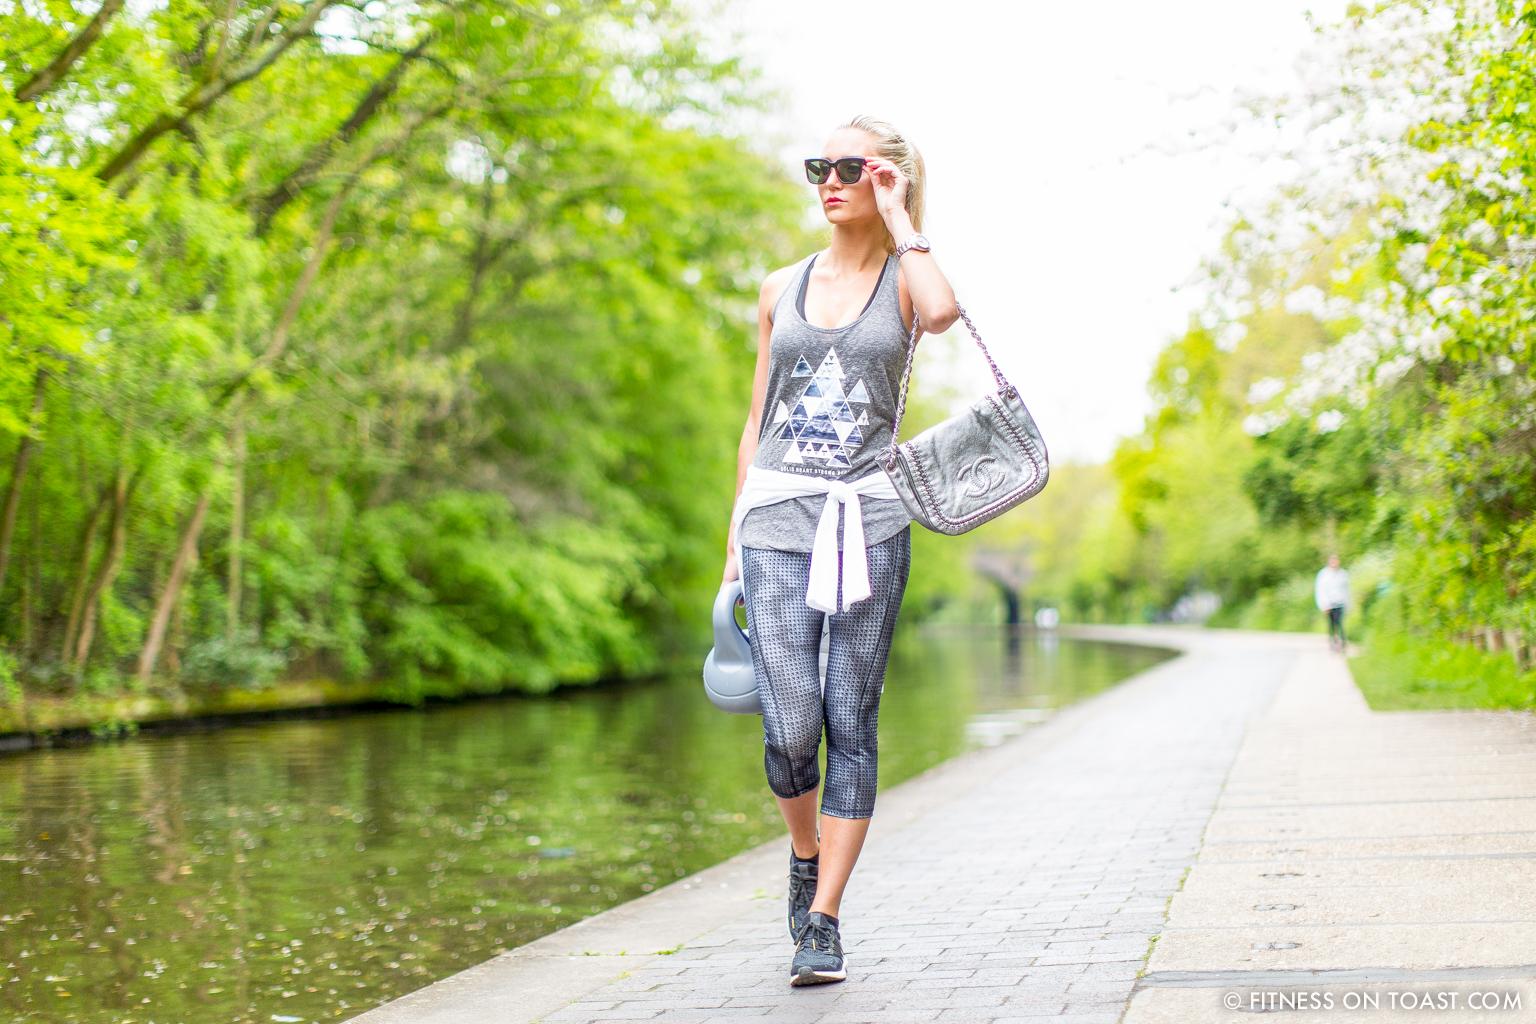 Fitness On Toast Faya Blog Girl Healthy Workout Regents Canal London Kettle Bell Squat Swing Lunge Twist Burpees Old Navy Fashion OOTD Gap Chanel Celine